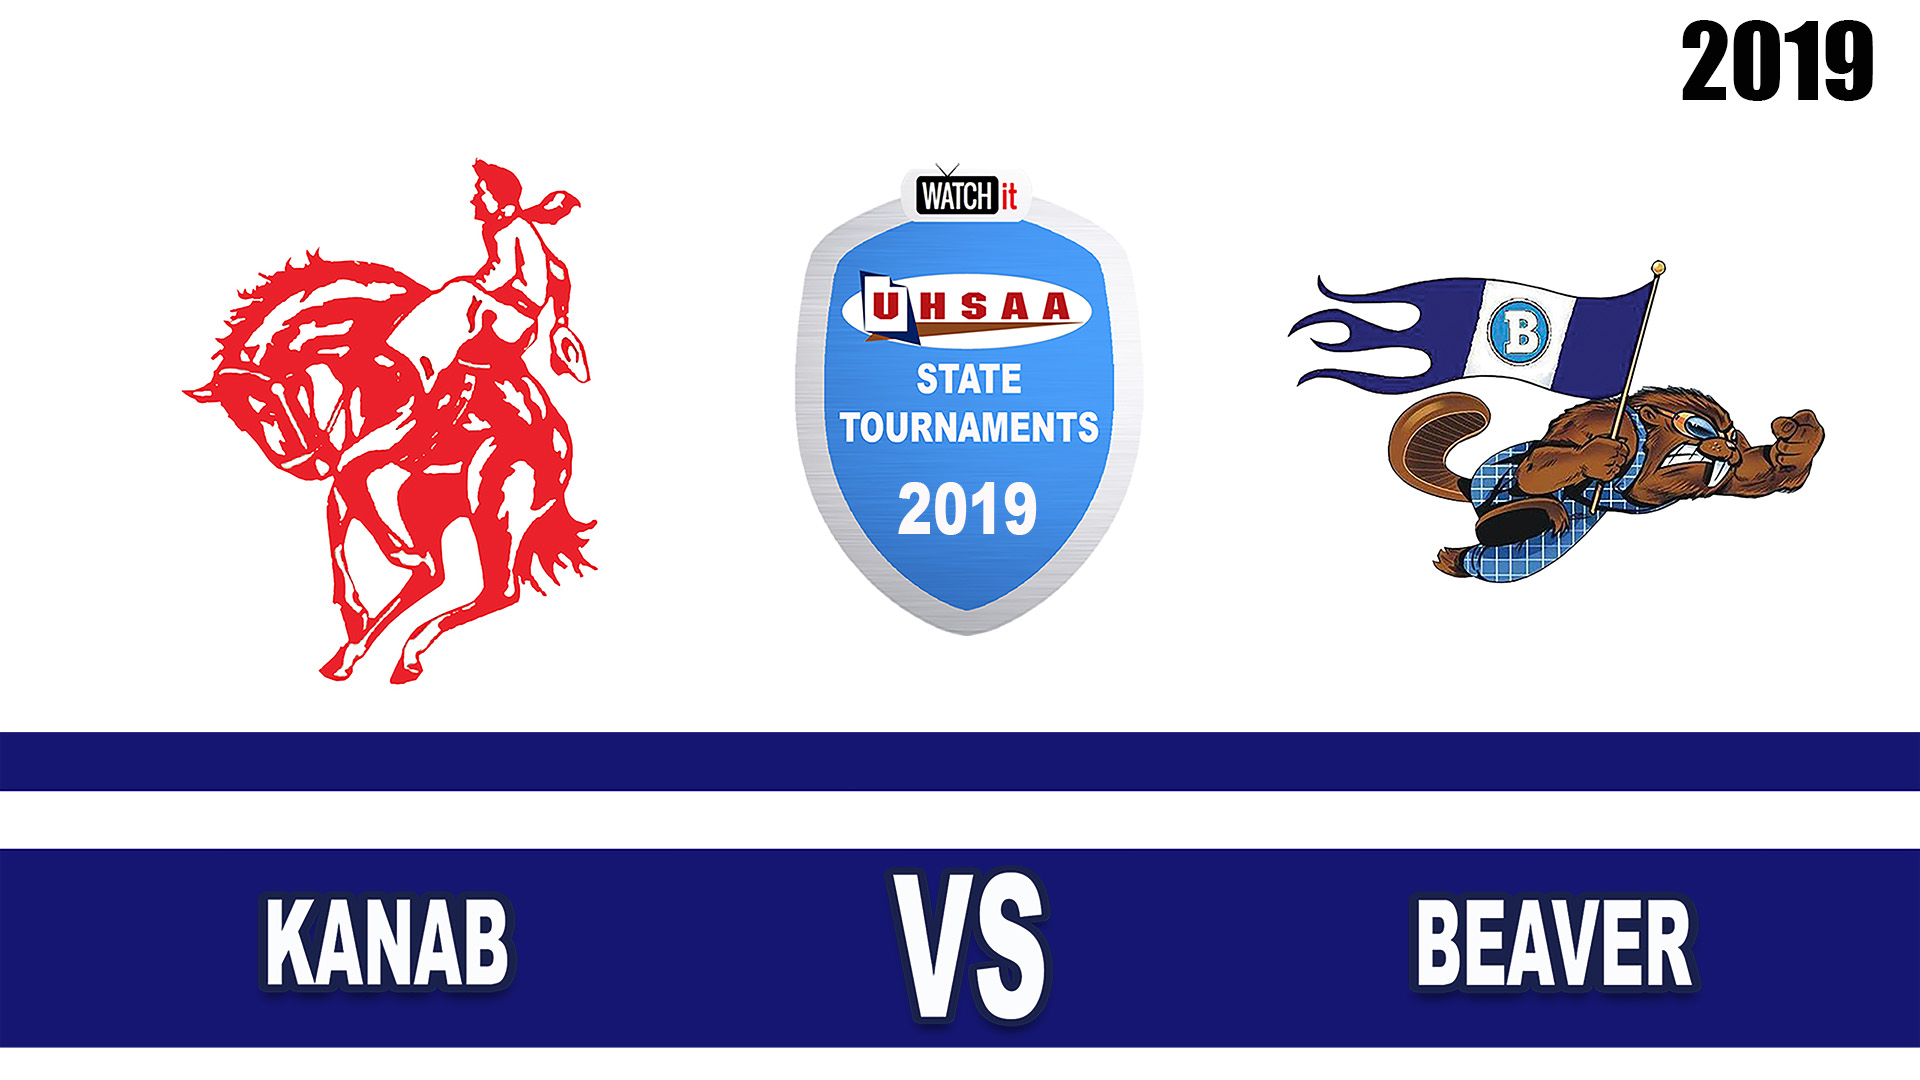 2A girls championship: Kanab (21-3) vs. Beaver (20-3), 5 p.m.